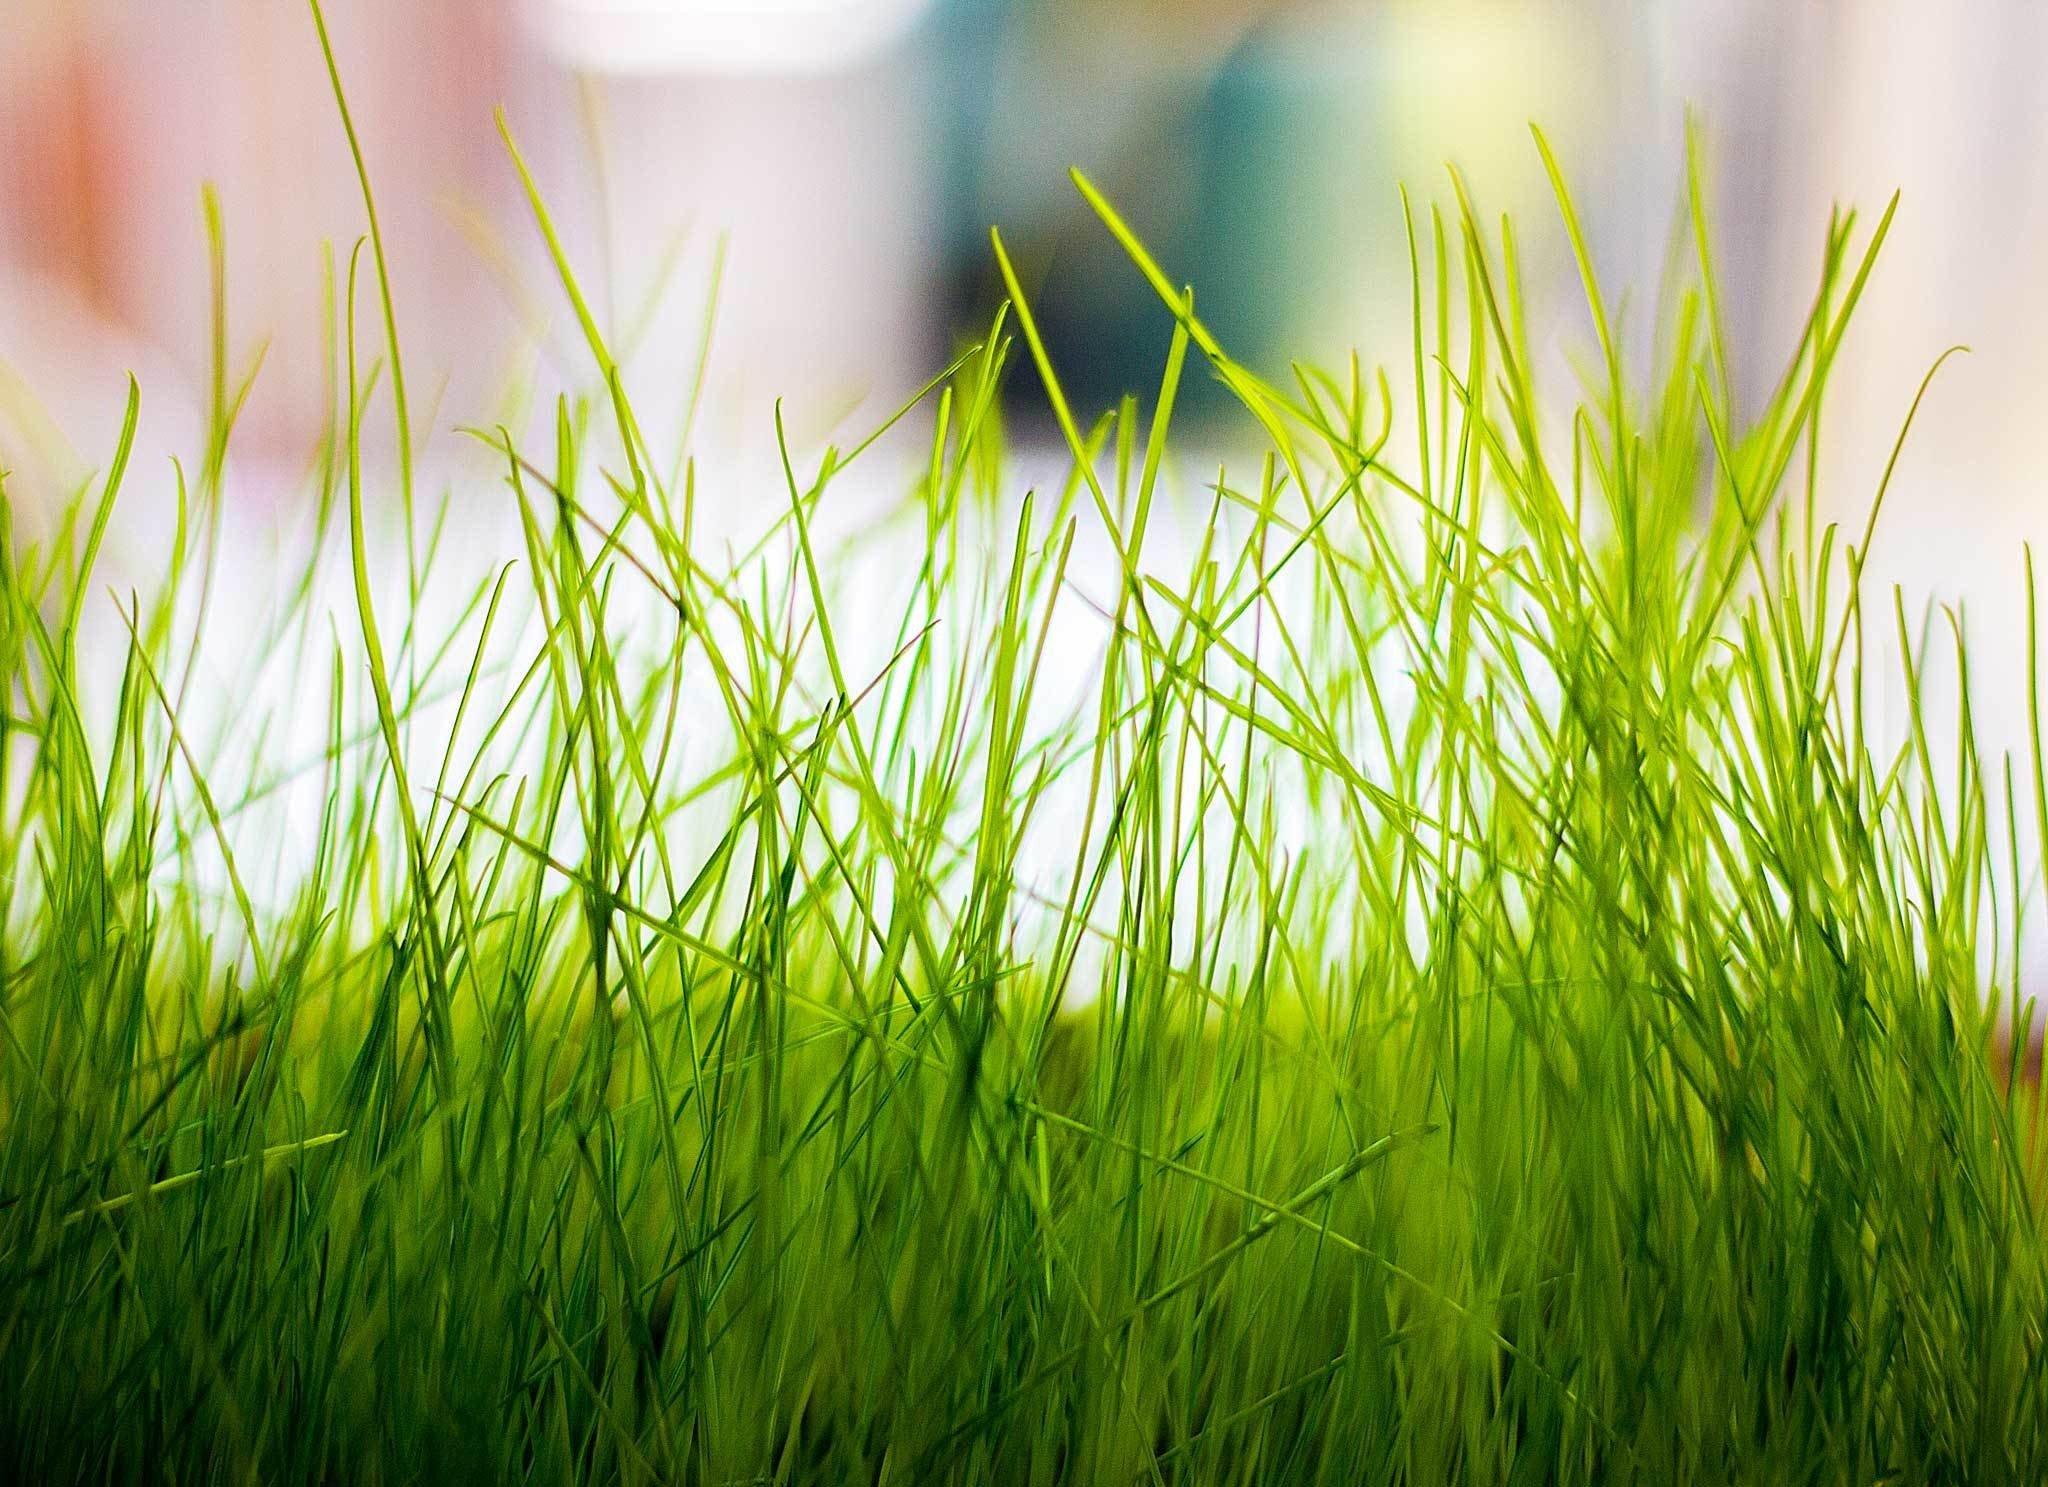 grass macro photography - photo #36